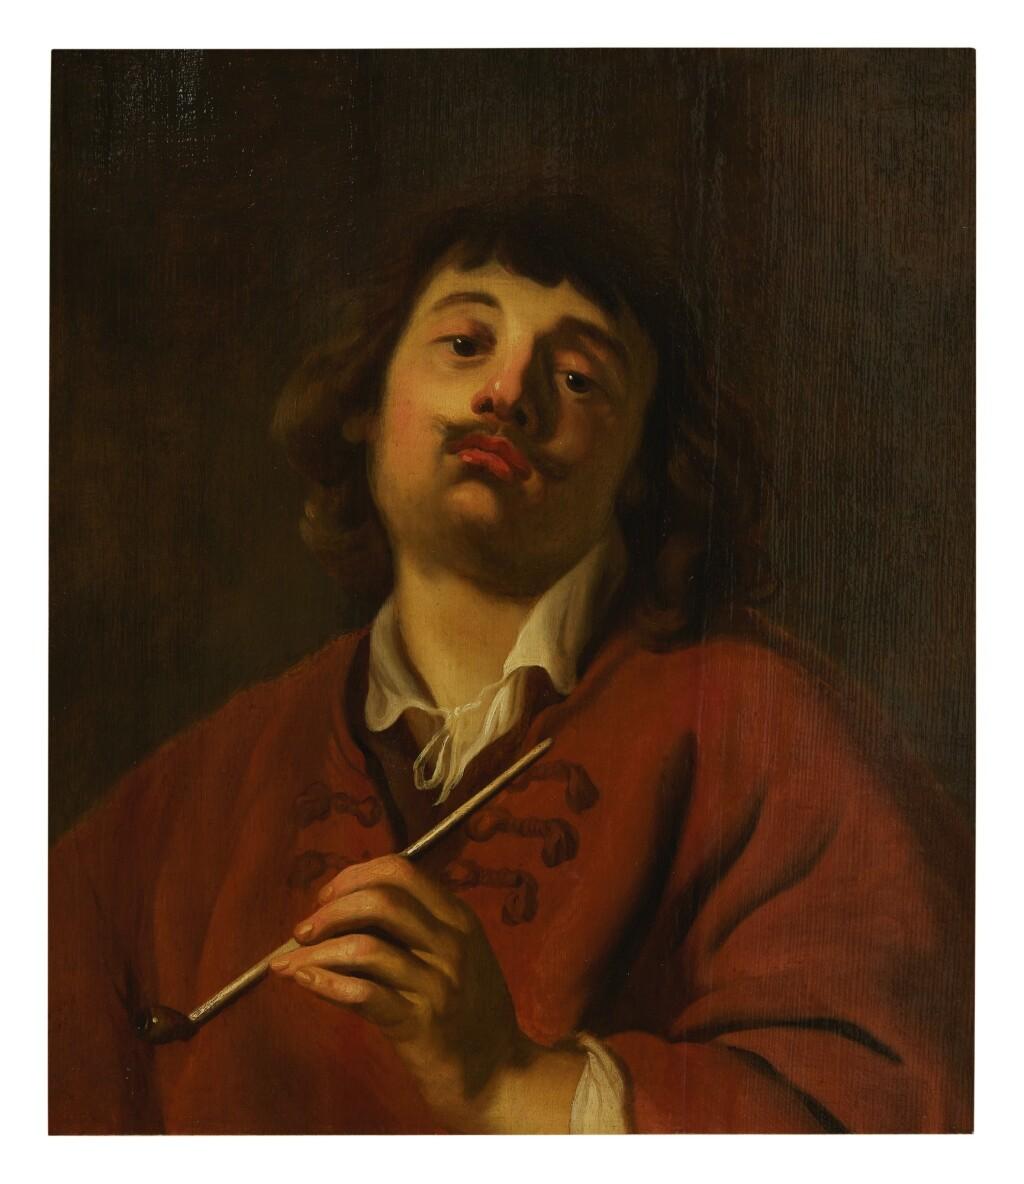 CIRCLE OF JACOB ADRIAENSZ BACKER   PORTRAIT OF A MAN SMOKING A PIPE (THE SENSE OF SMELL)